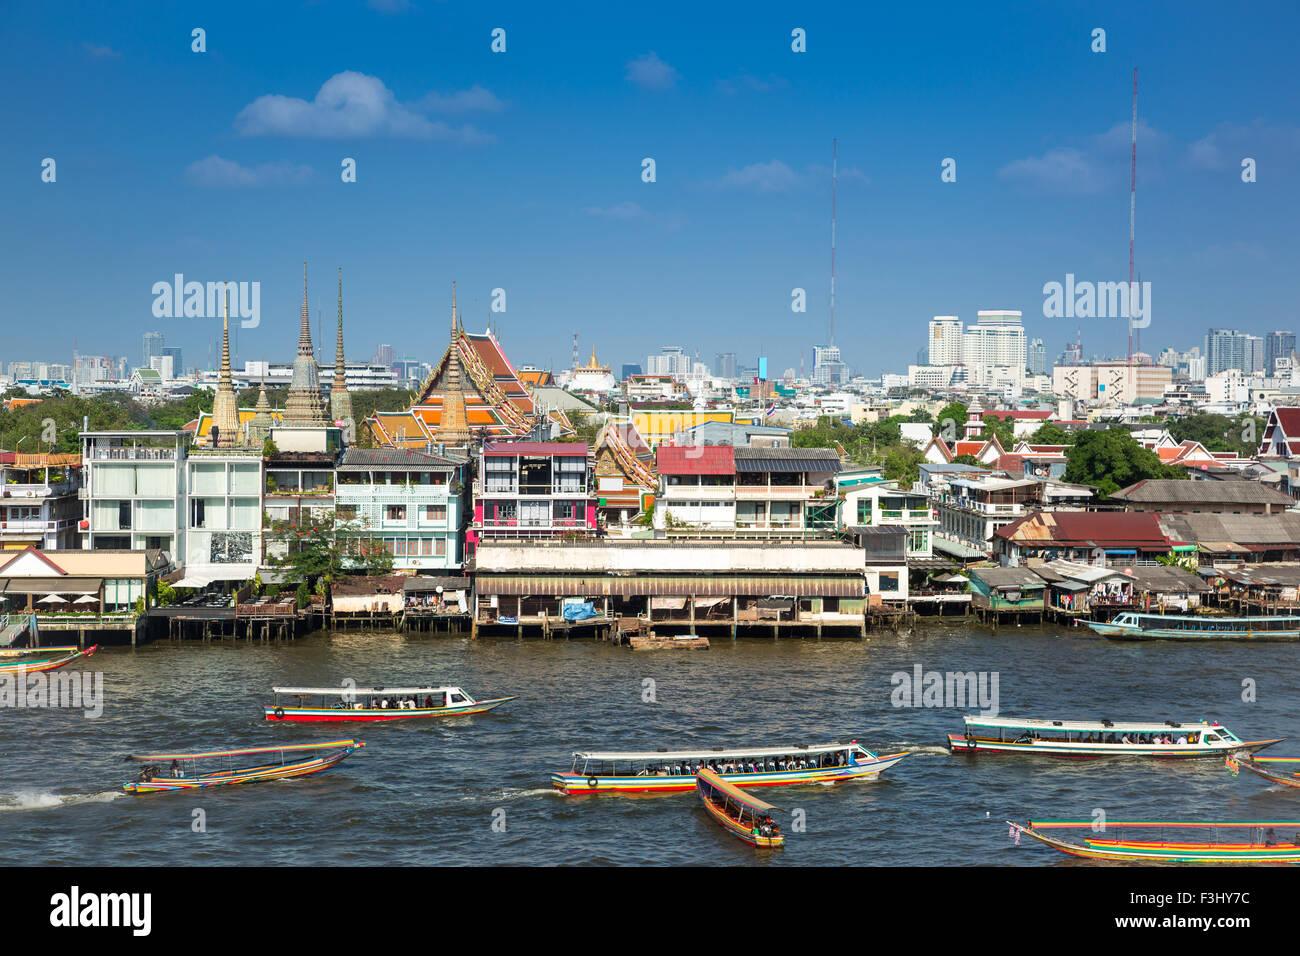 Belle river side ville de Bangkok, Thaïlande Photo Stock